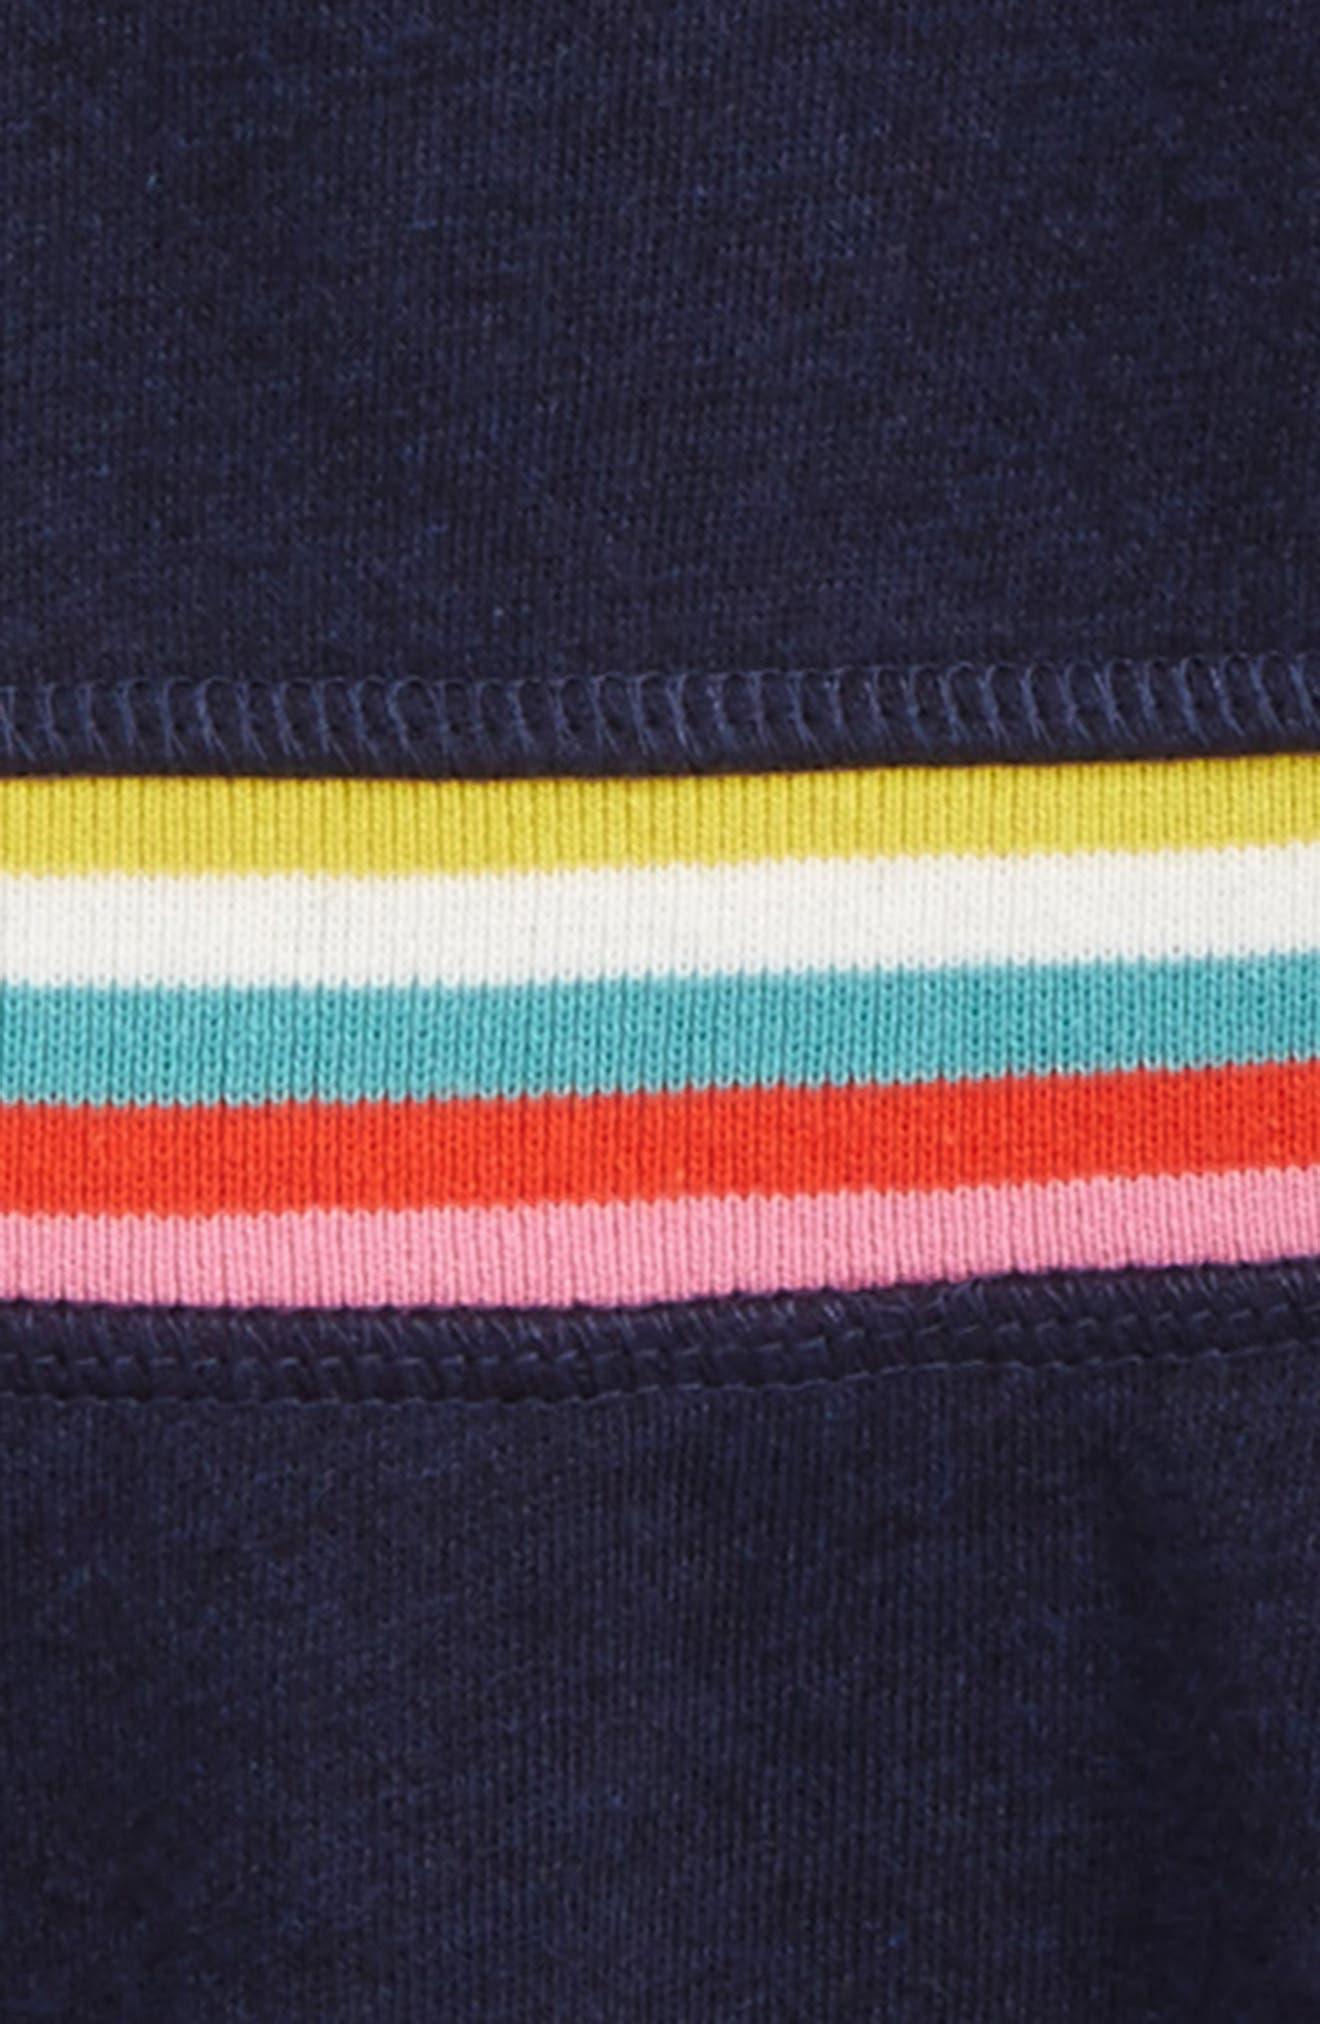 Cosy Sweatshirt Dress,                             Alternate thumbnail 2, color,                             414